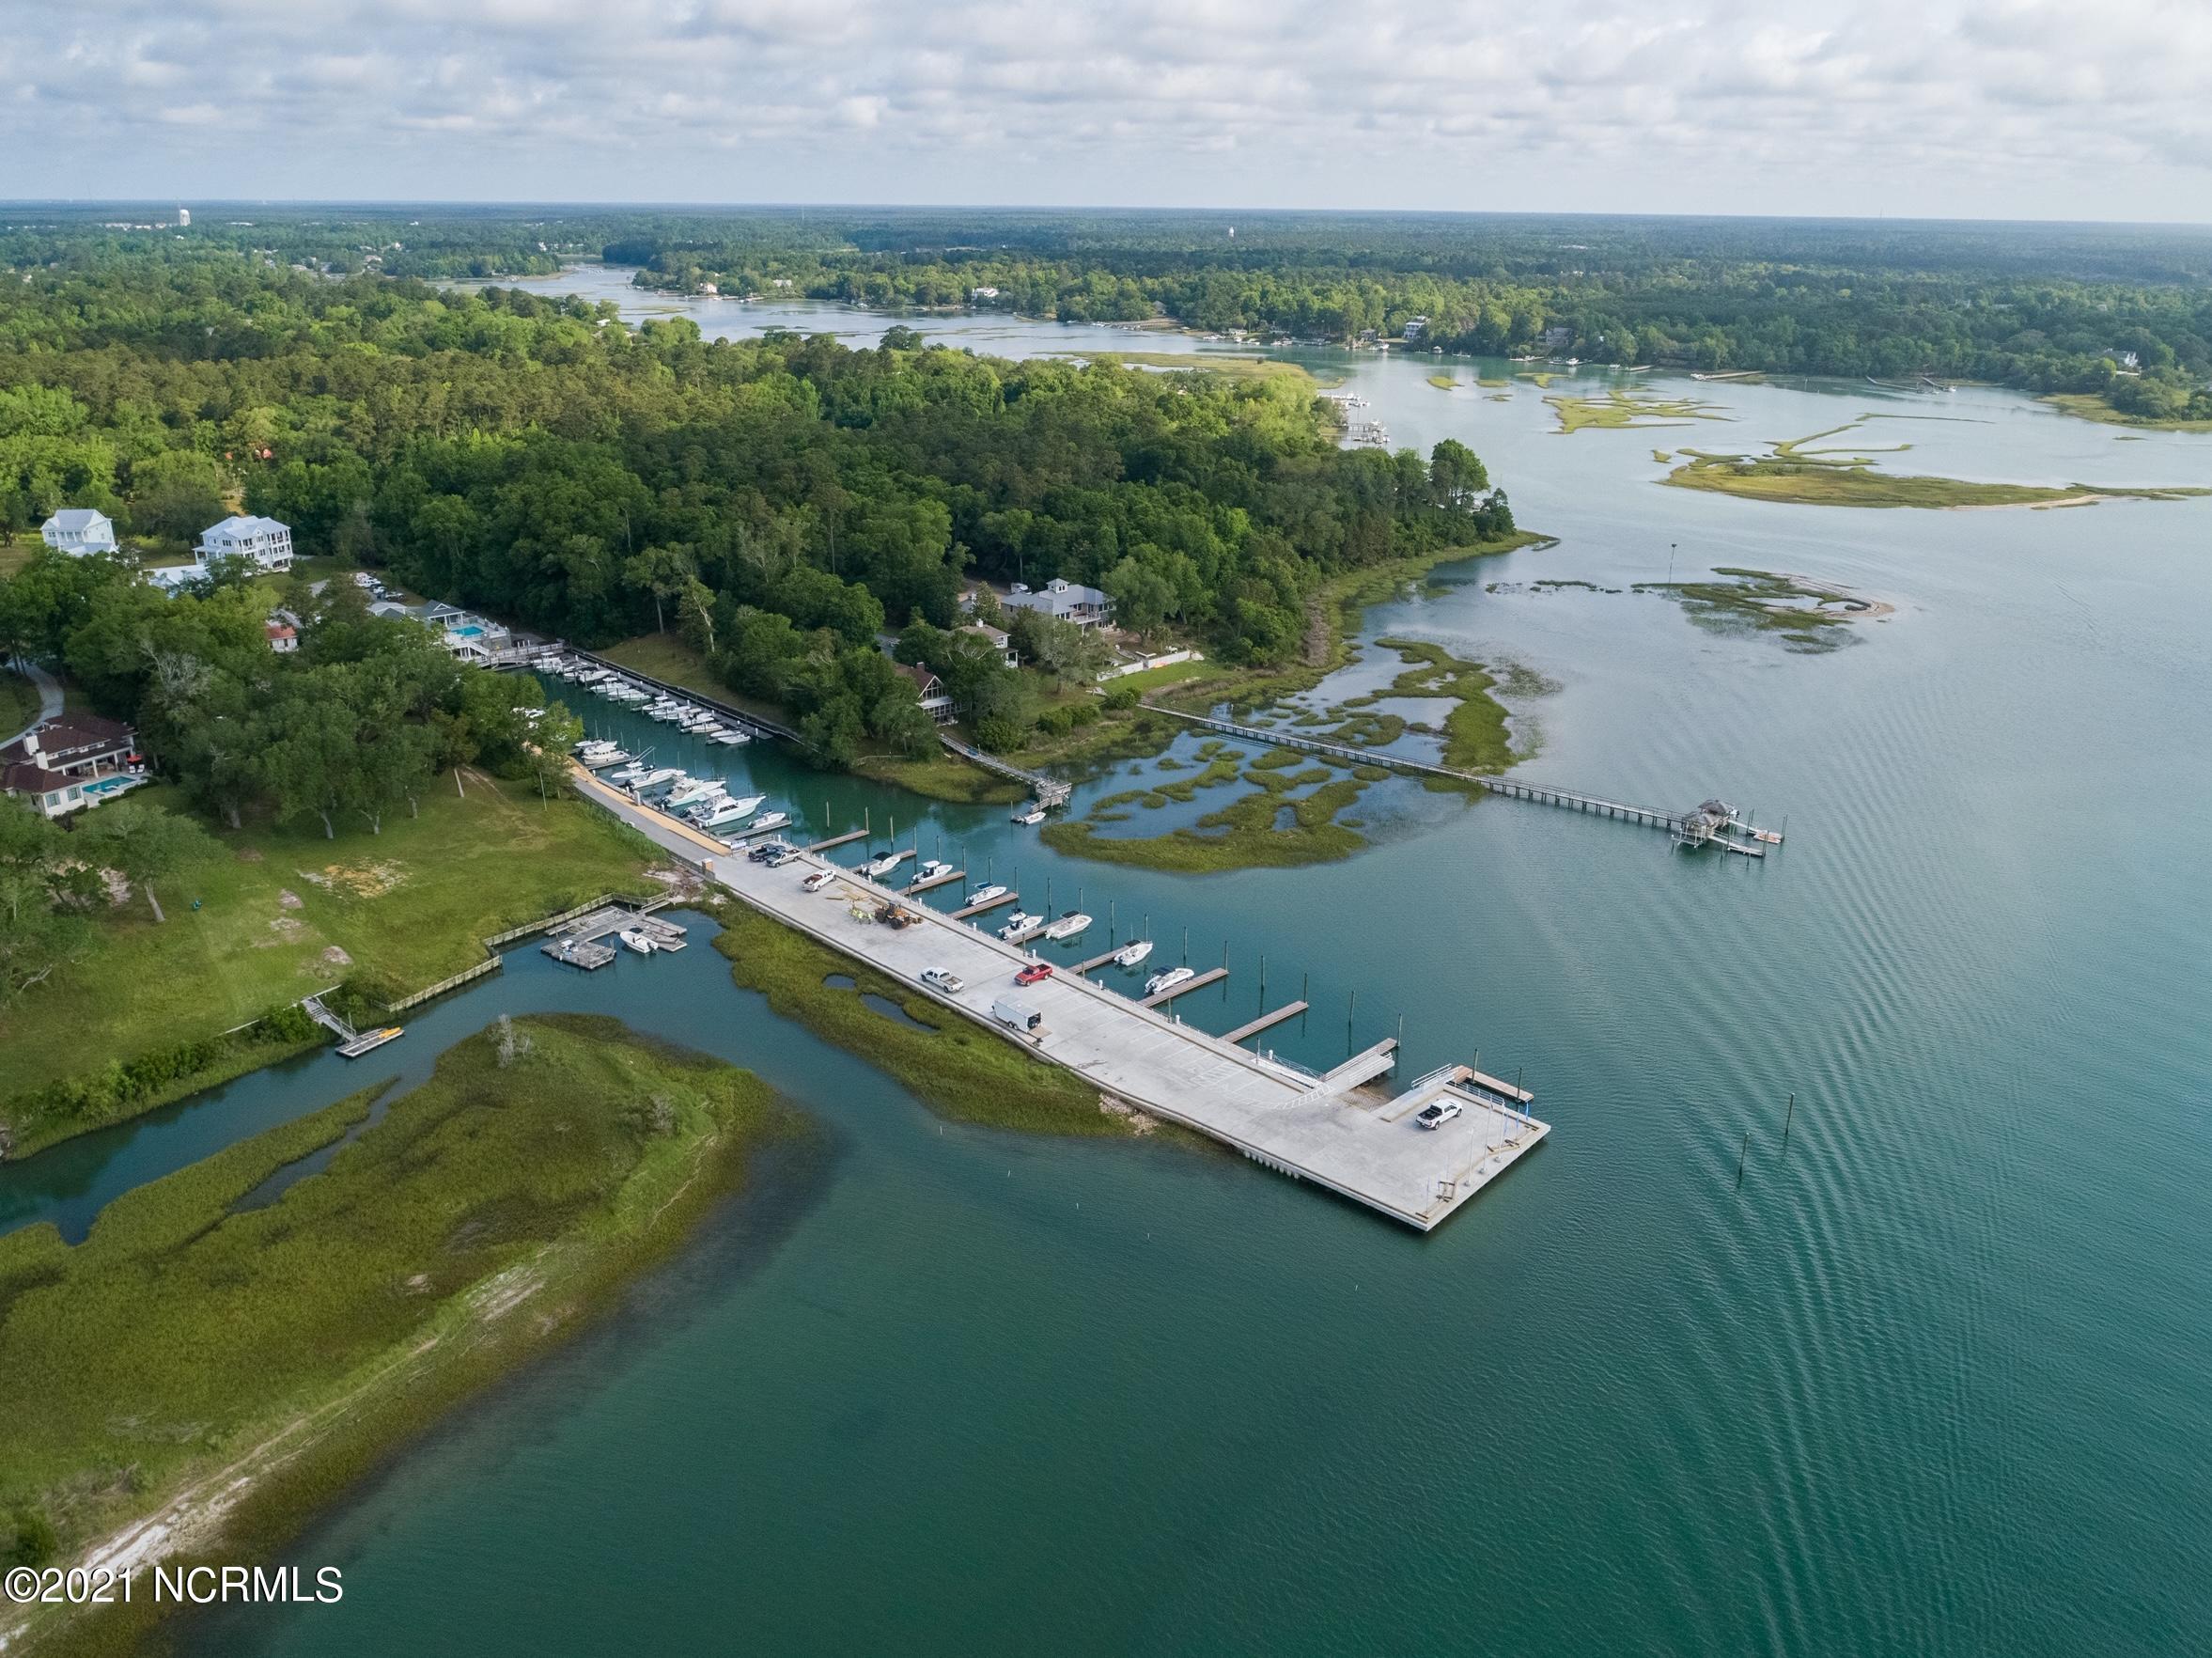 7465 Nautica Yacht Club Drive, Wilmington, North Carolina 28411, ,Wet,For sale,Nautica Yacht Club,100277073